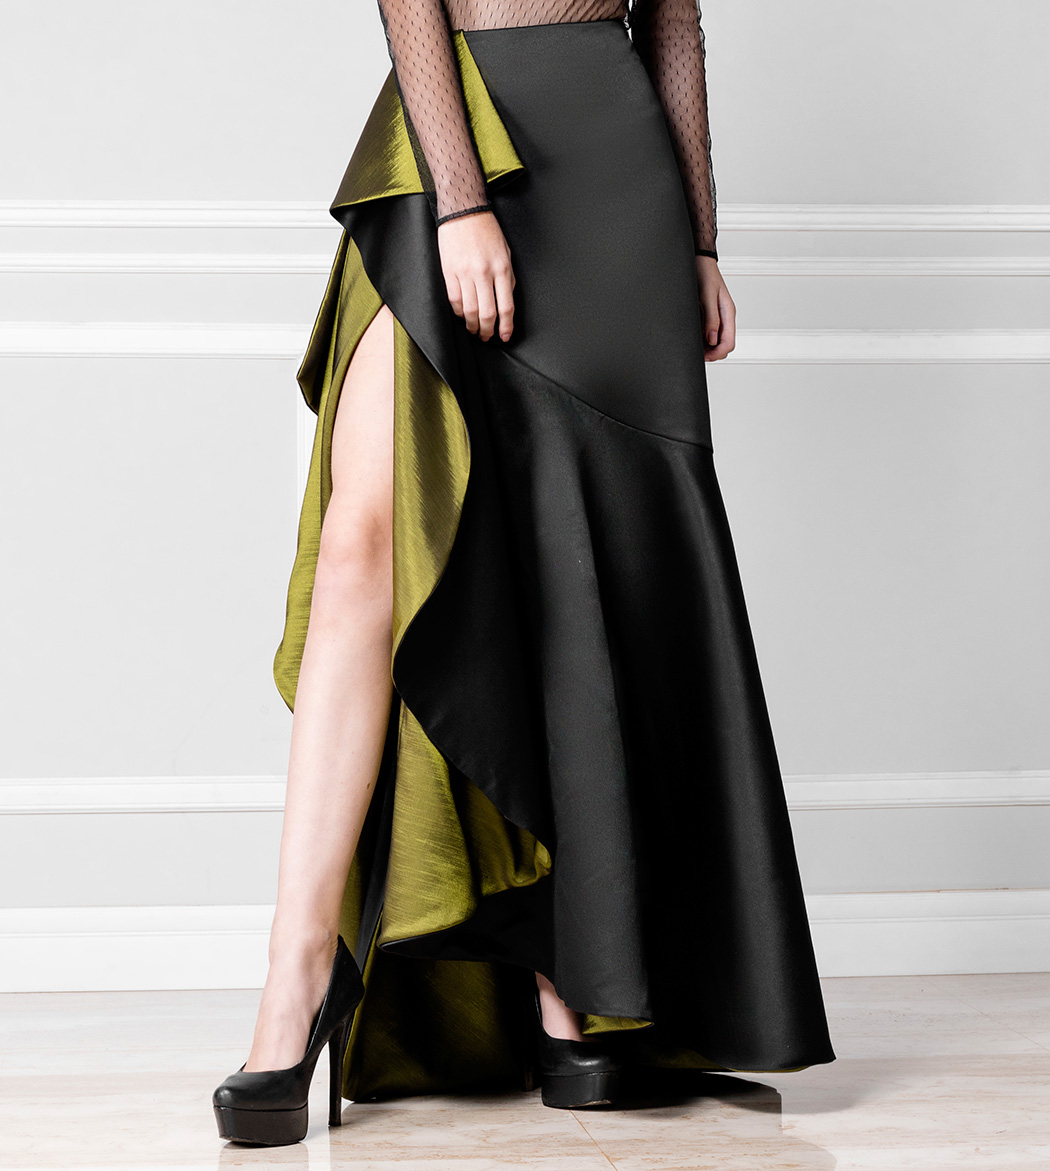 Falda negra con volantes verdes — Nathalia Forkin dcef7062e1b5